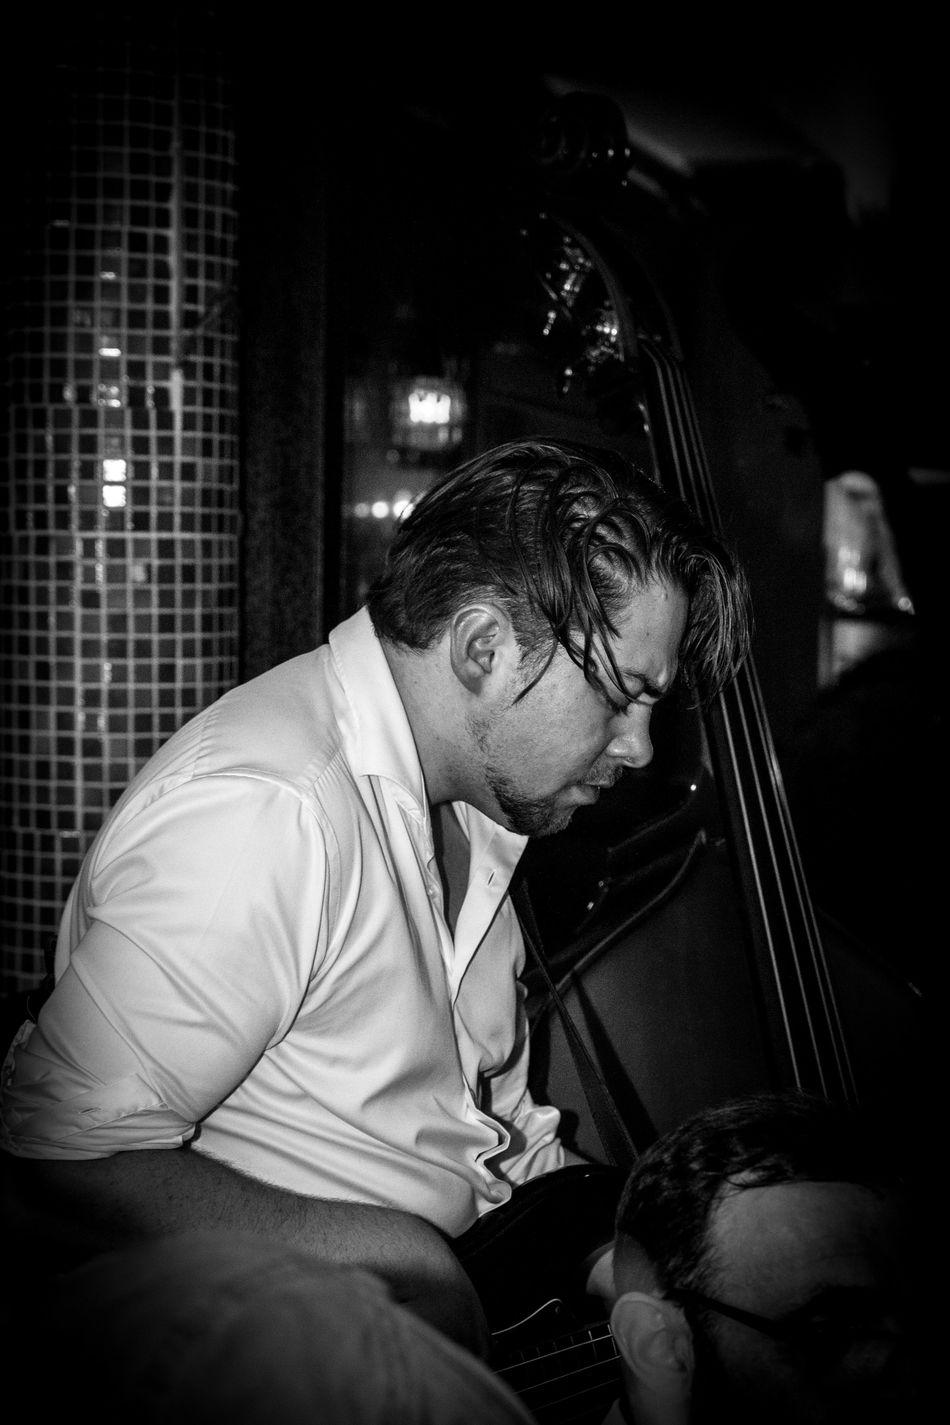 Bass Bassist Black And White Concert Concert Photography Https://bandnamedjacob.wordpress.com Jacob Konzert Live Live Music Men Michael Goldmann Music Musician Musiker One Person Only Men